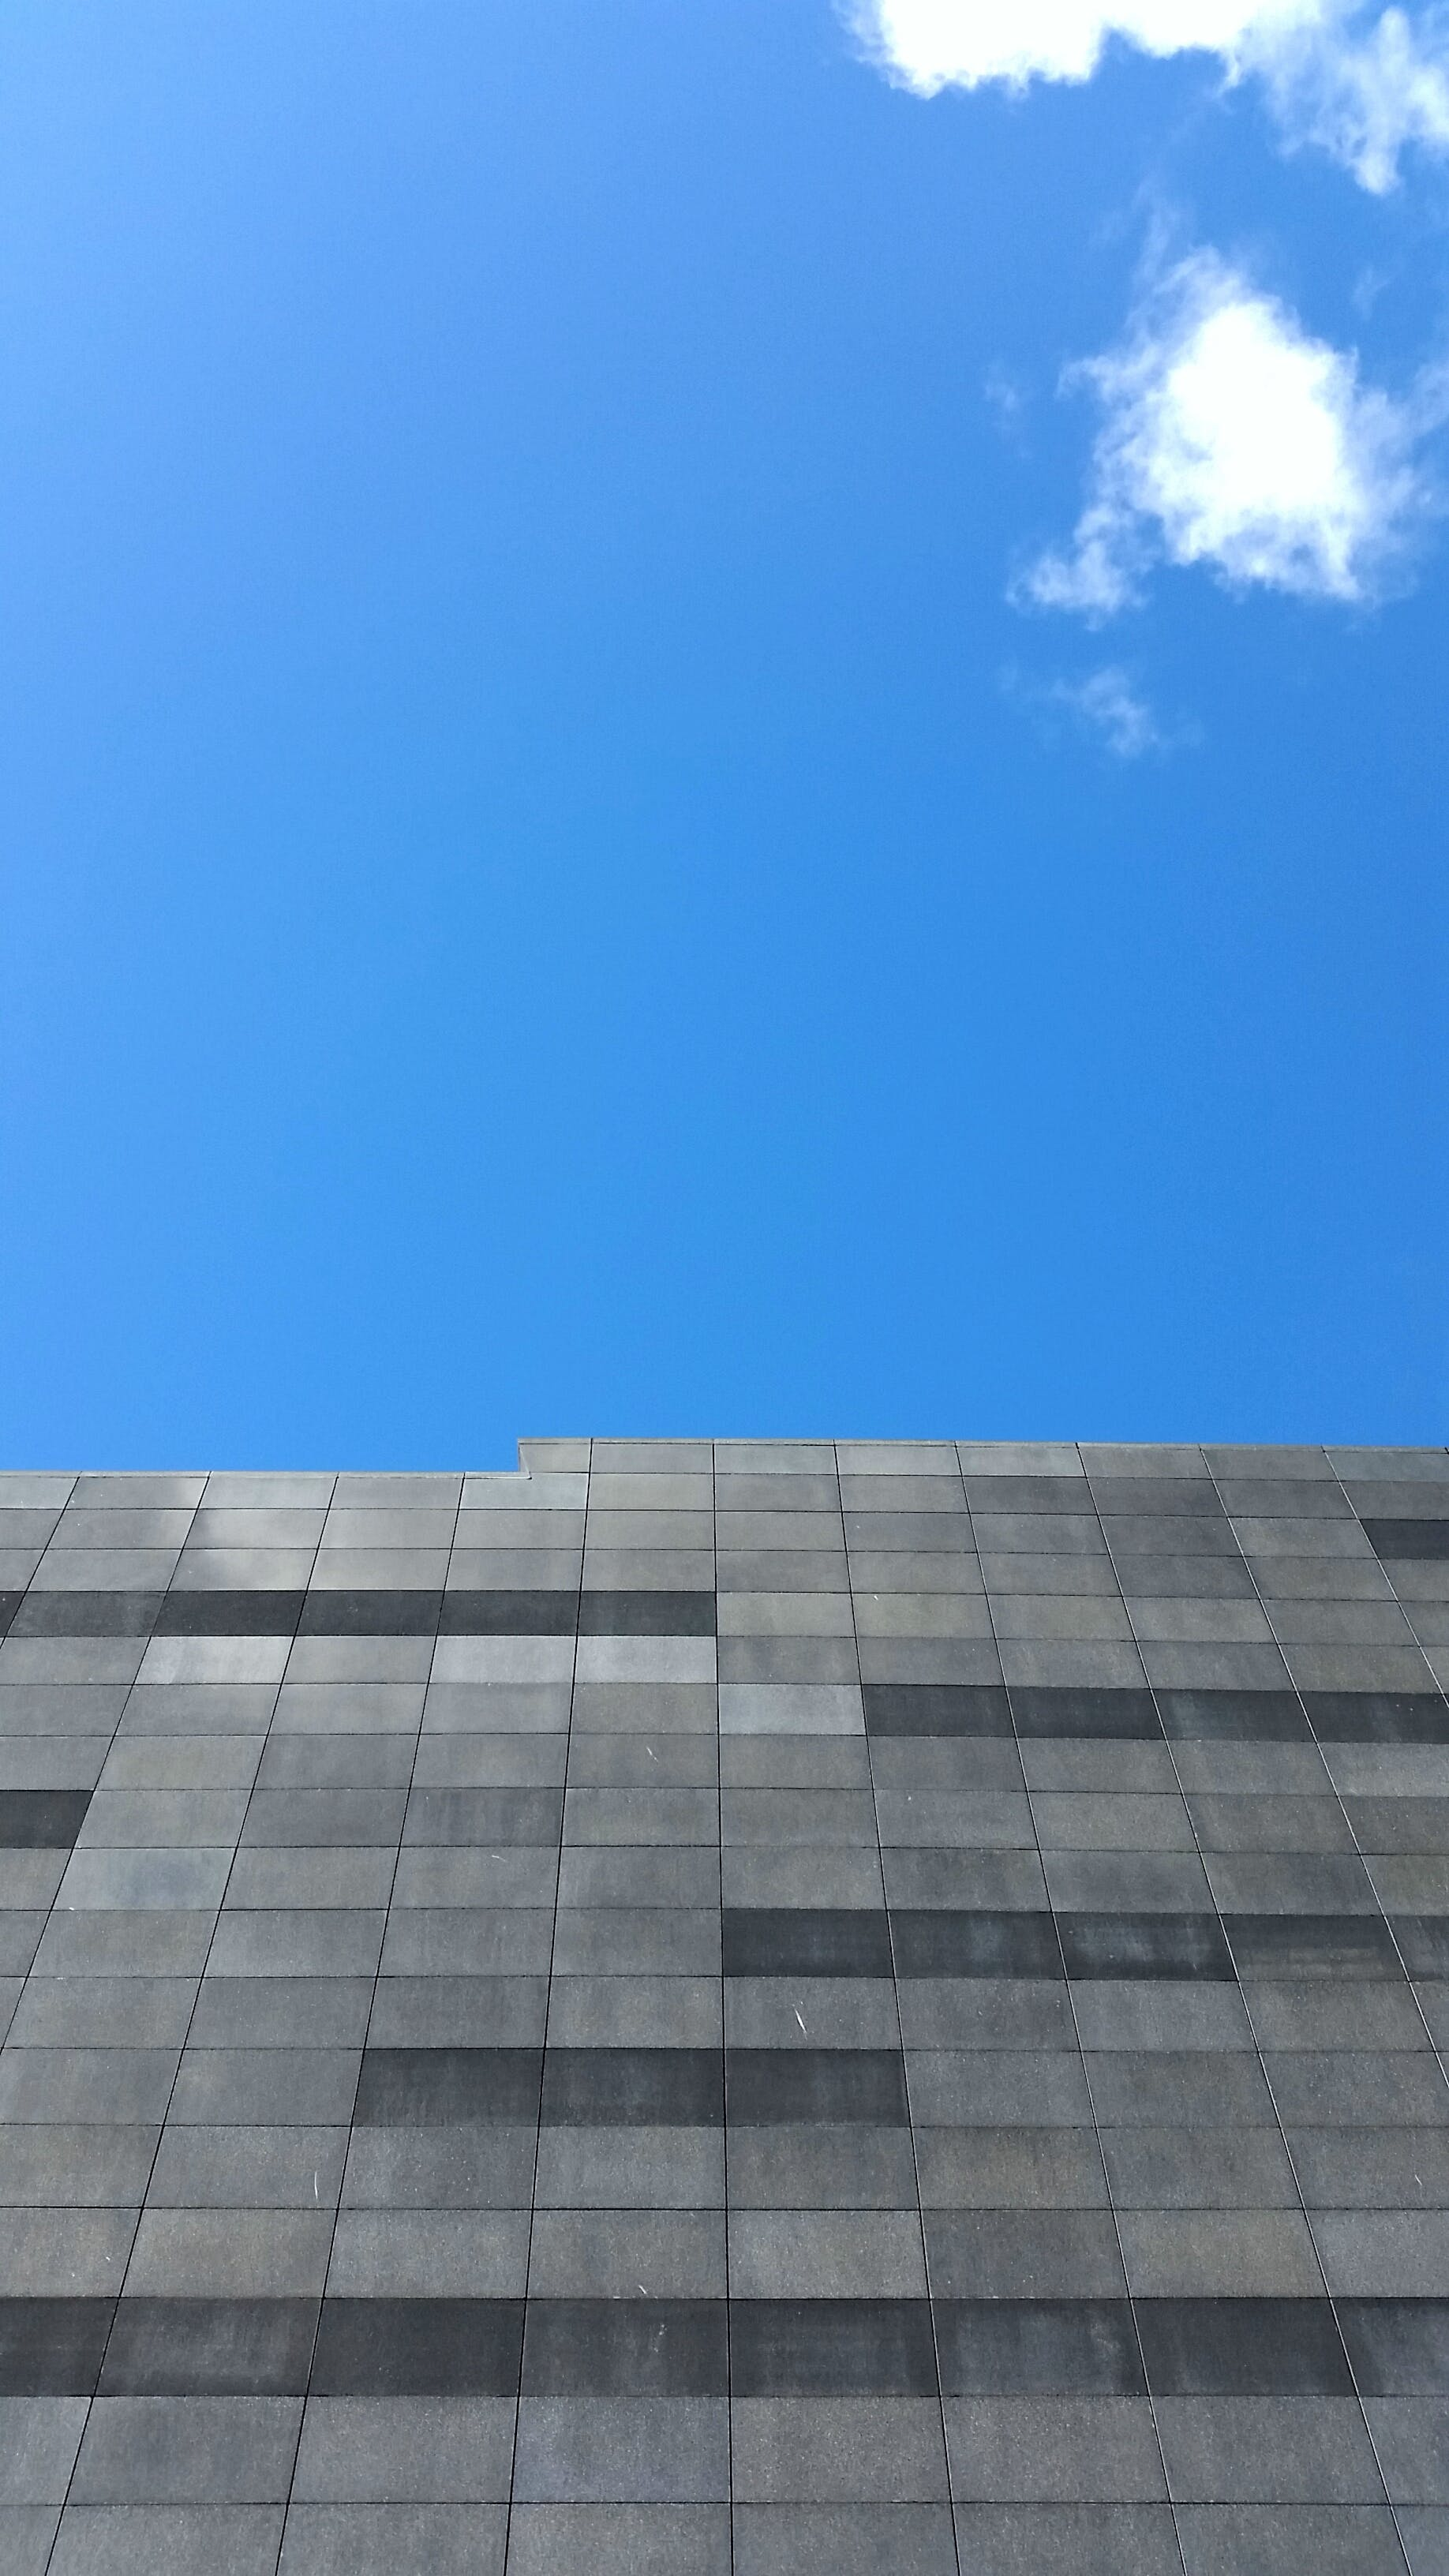 Free stock photo of blue sky, brick wall, clear sky, grey